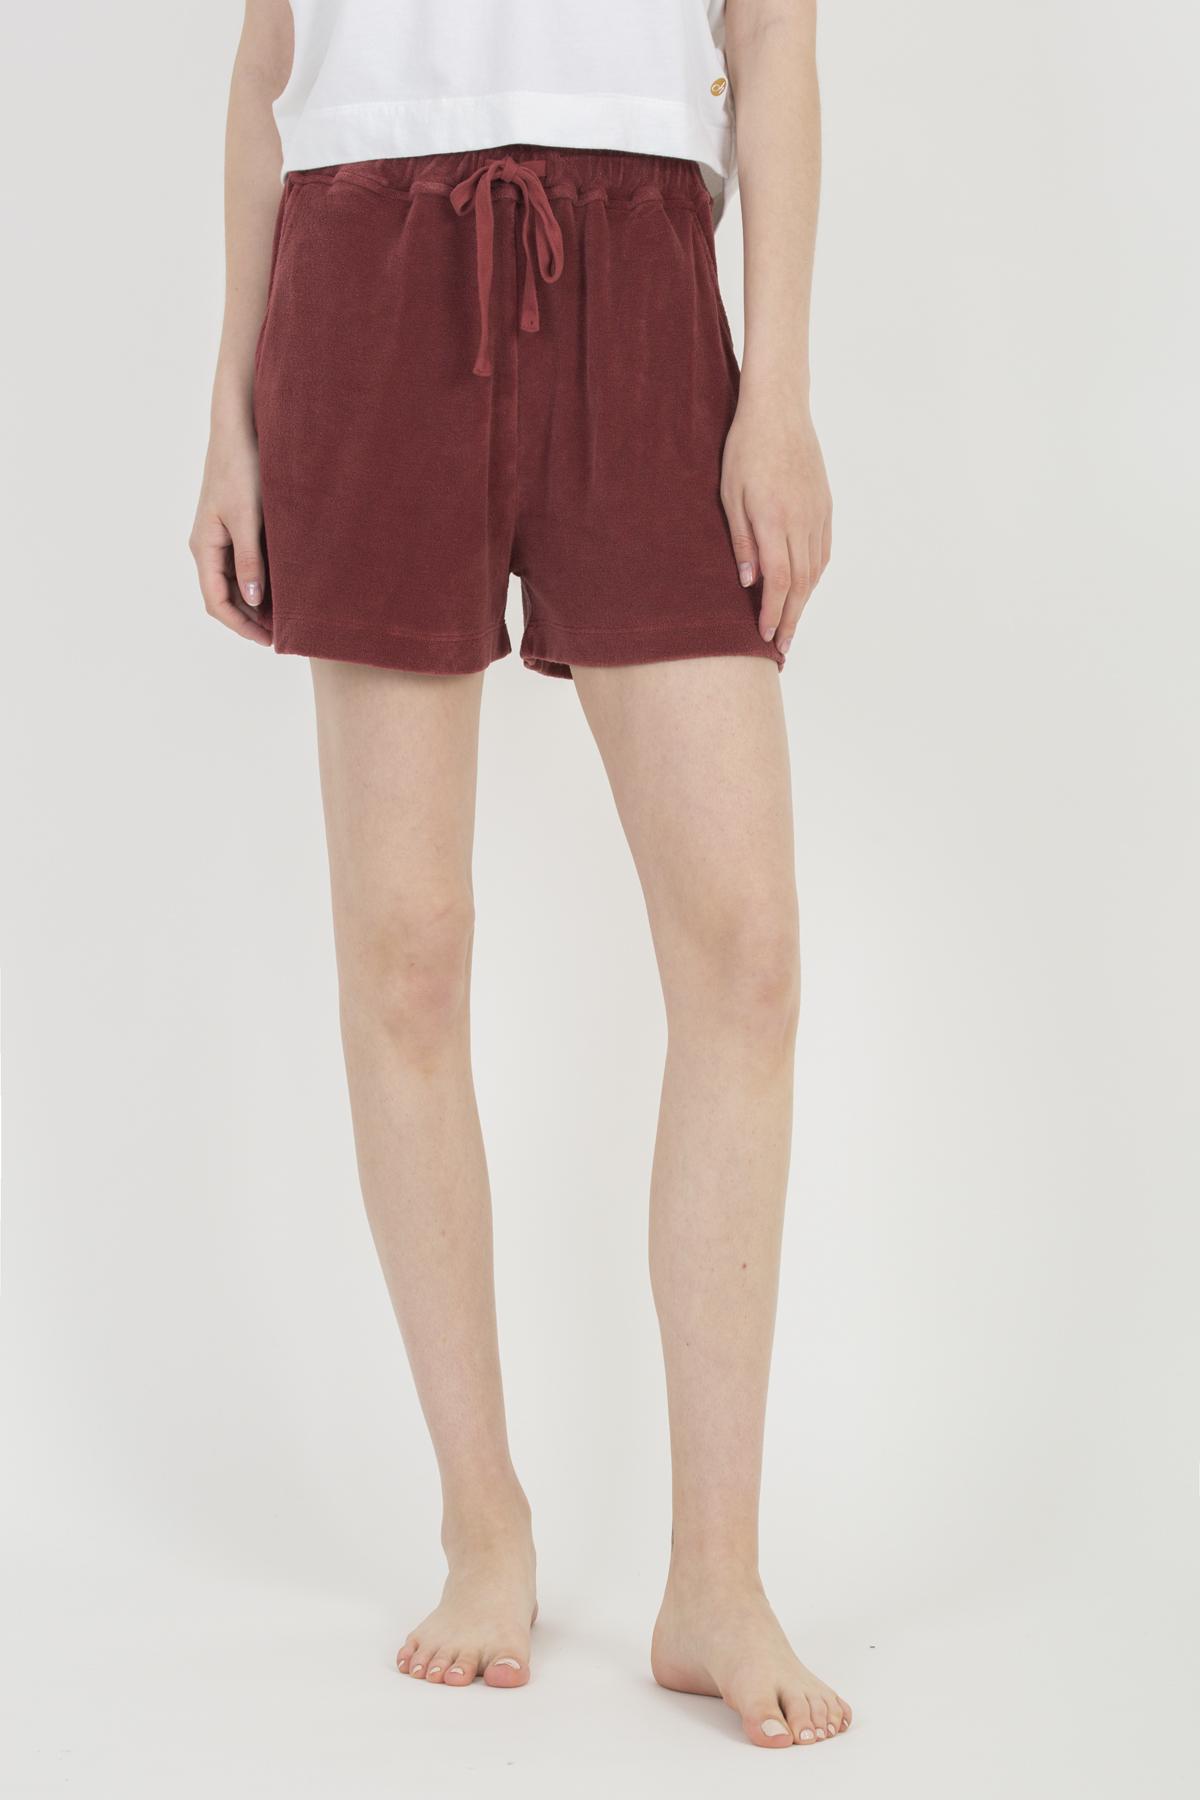 malgr-towel-shorts-brick-crossley-matchboxathens